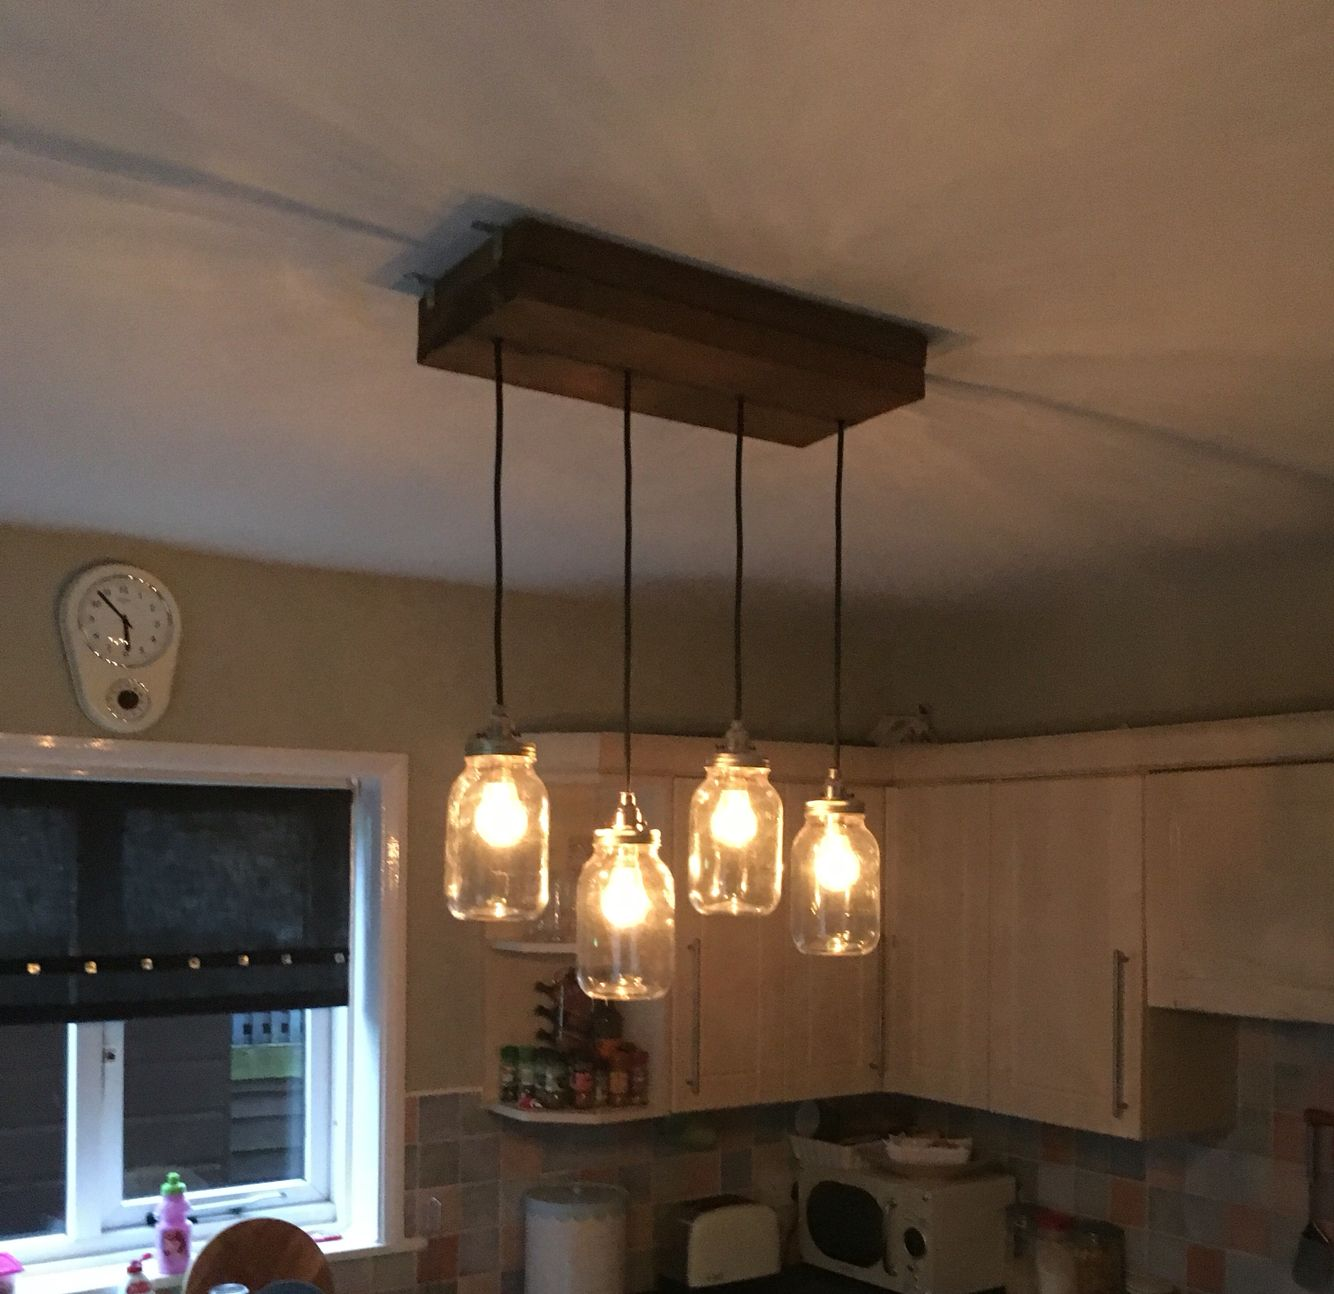 diy kitchen lighting. DIY Kitchen Light Fitting. Scaffolding Board, Kilner Jars Diy Lighting K